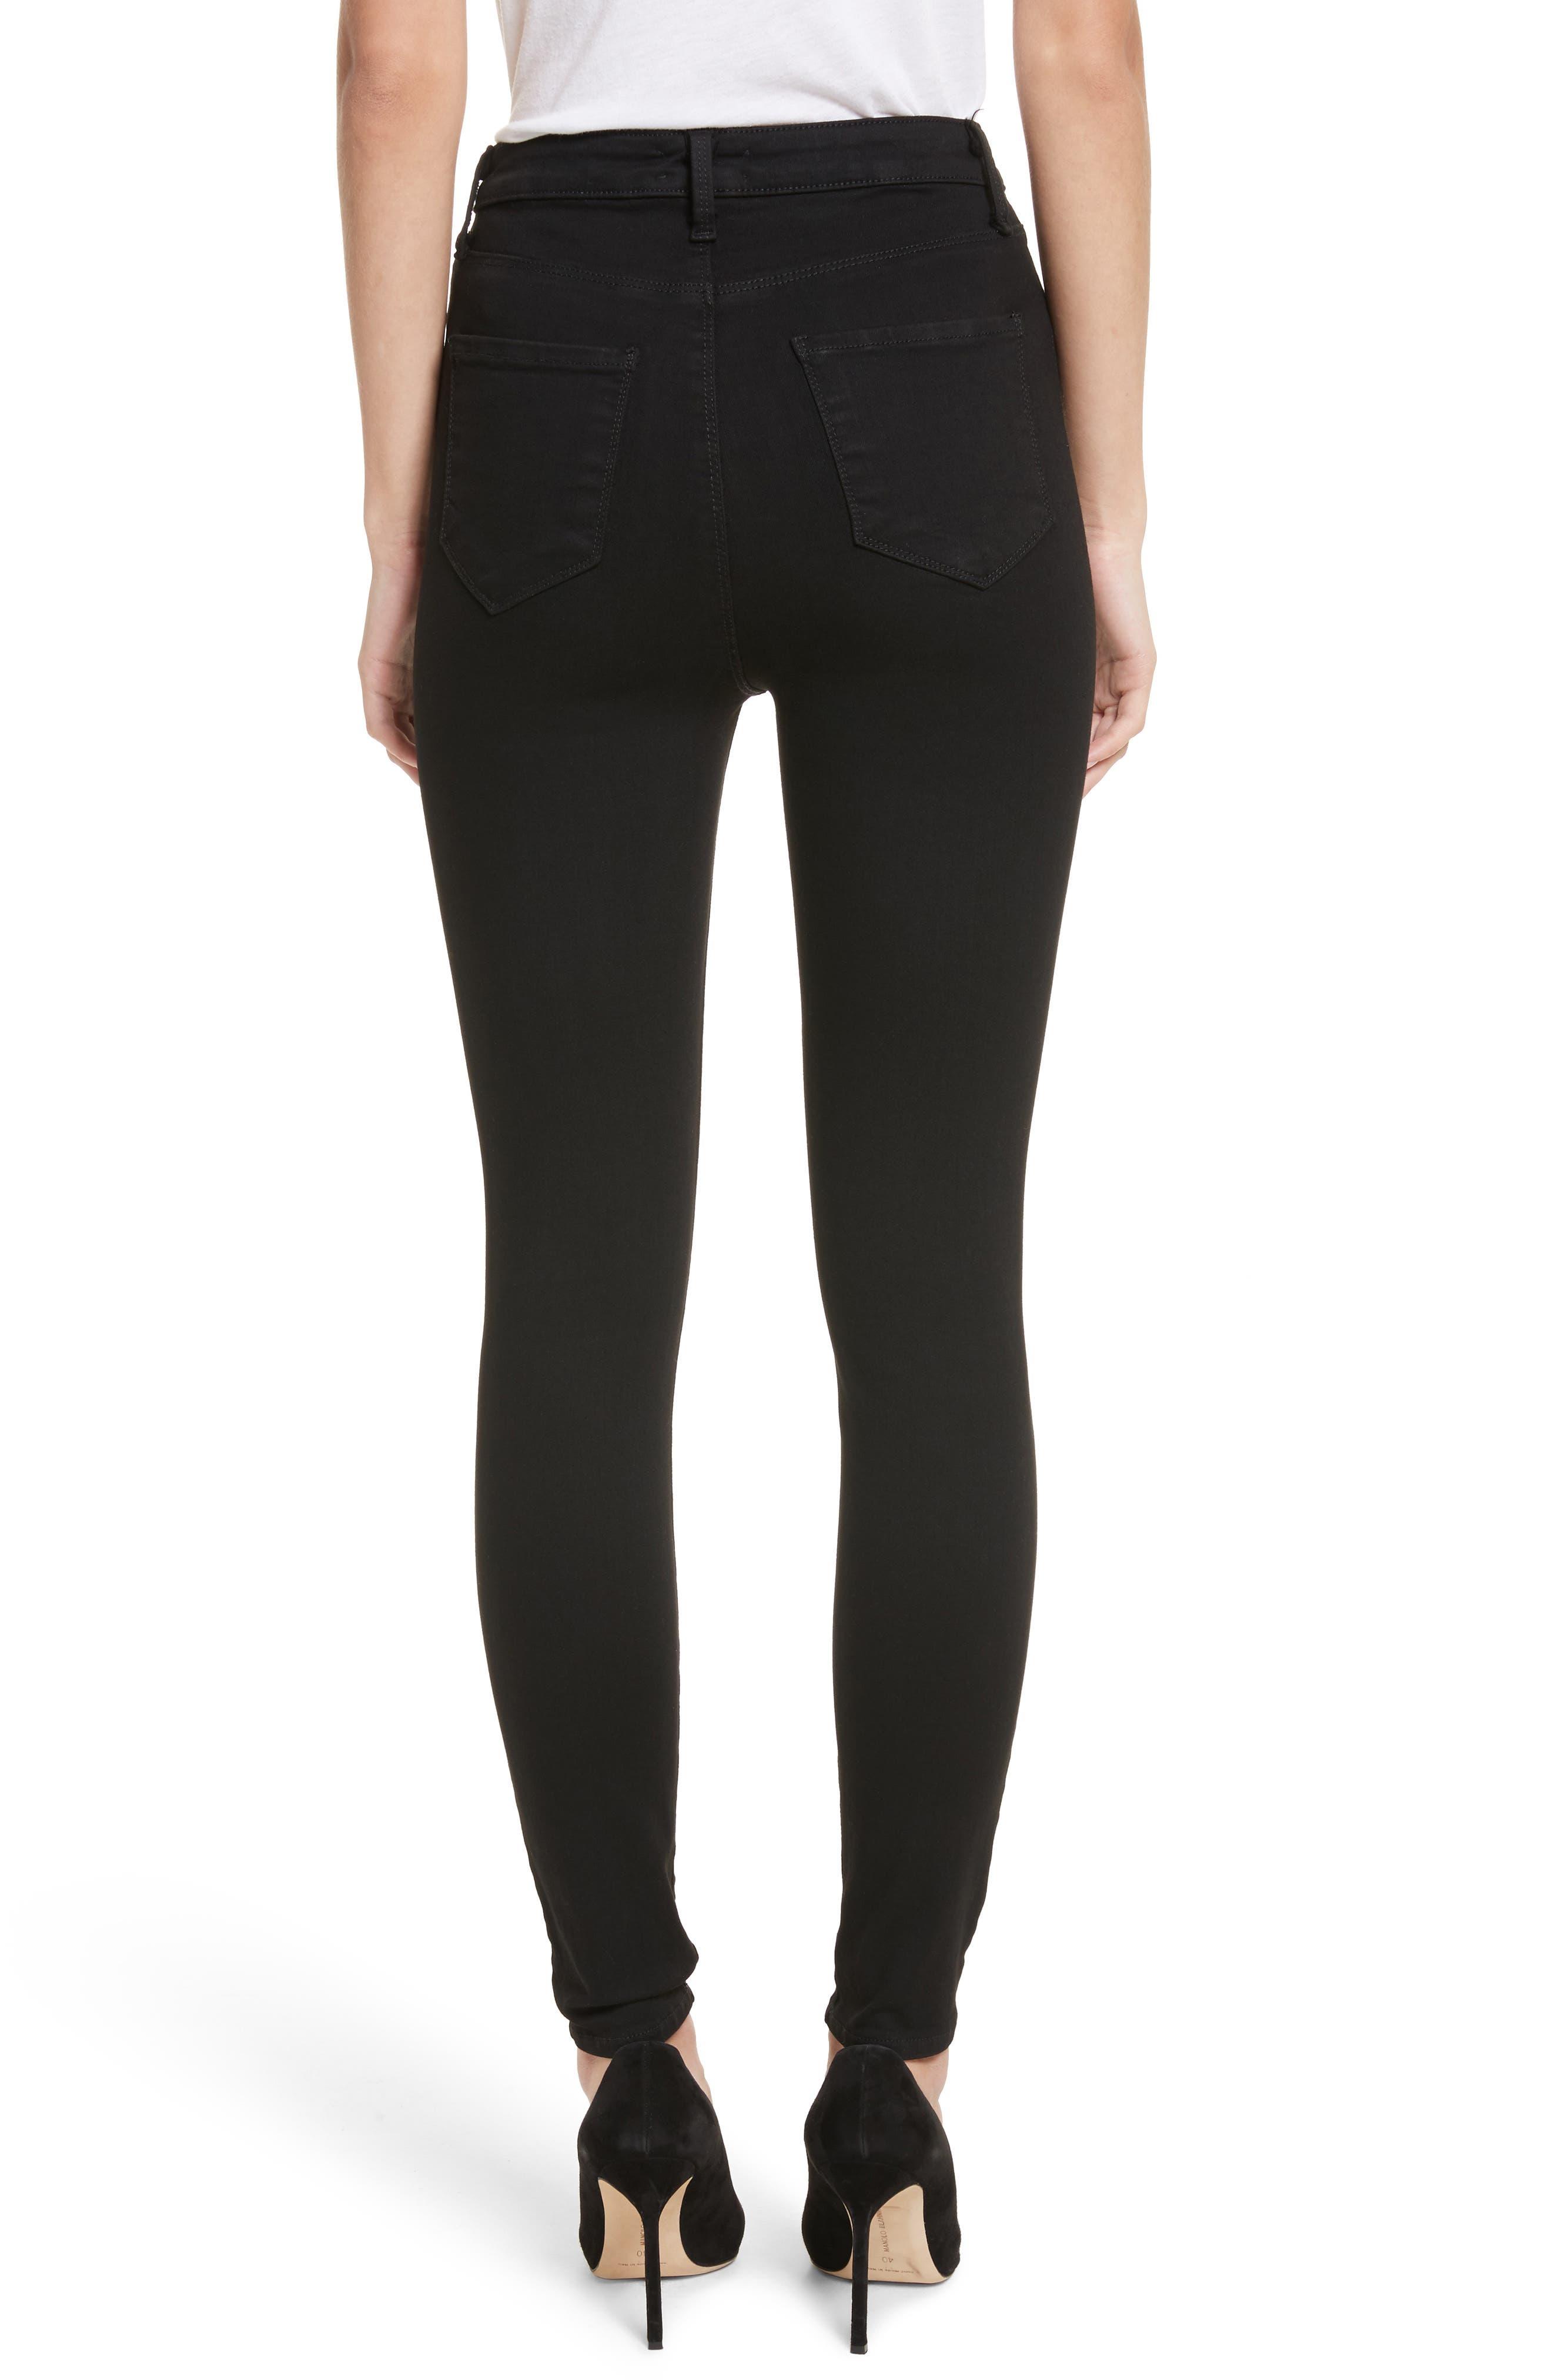 Katrina Ultra High Waist Skinny Jeans,                             Alternate thumbnail 2, color,                             Noir